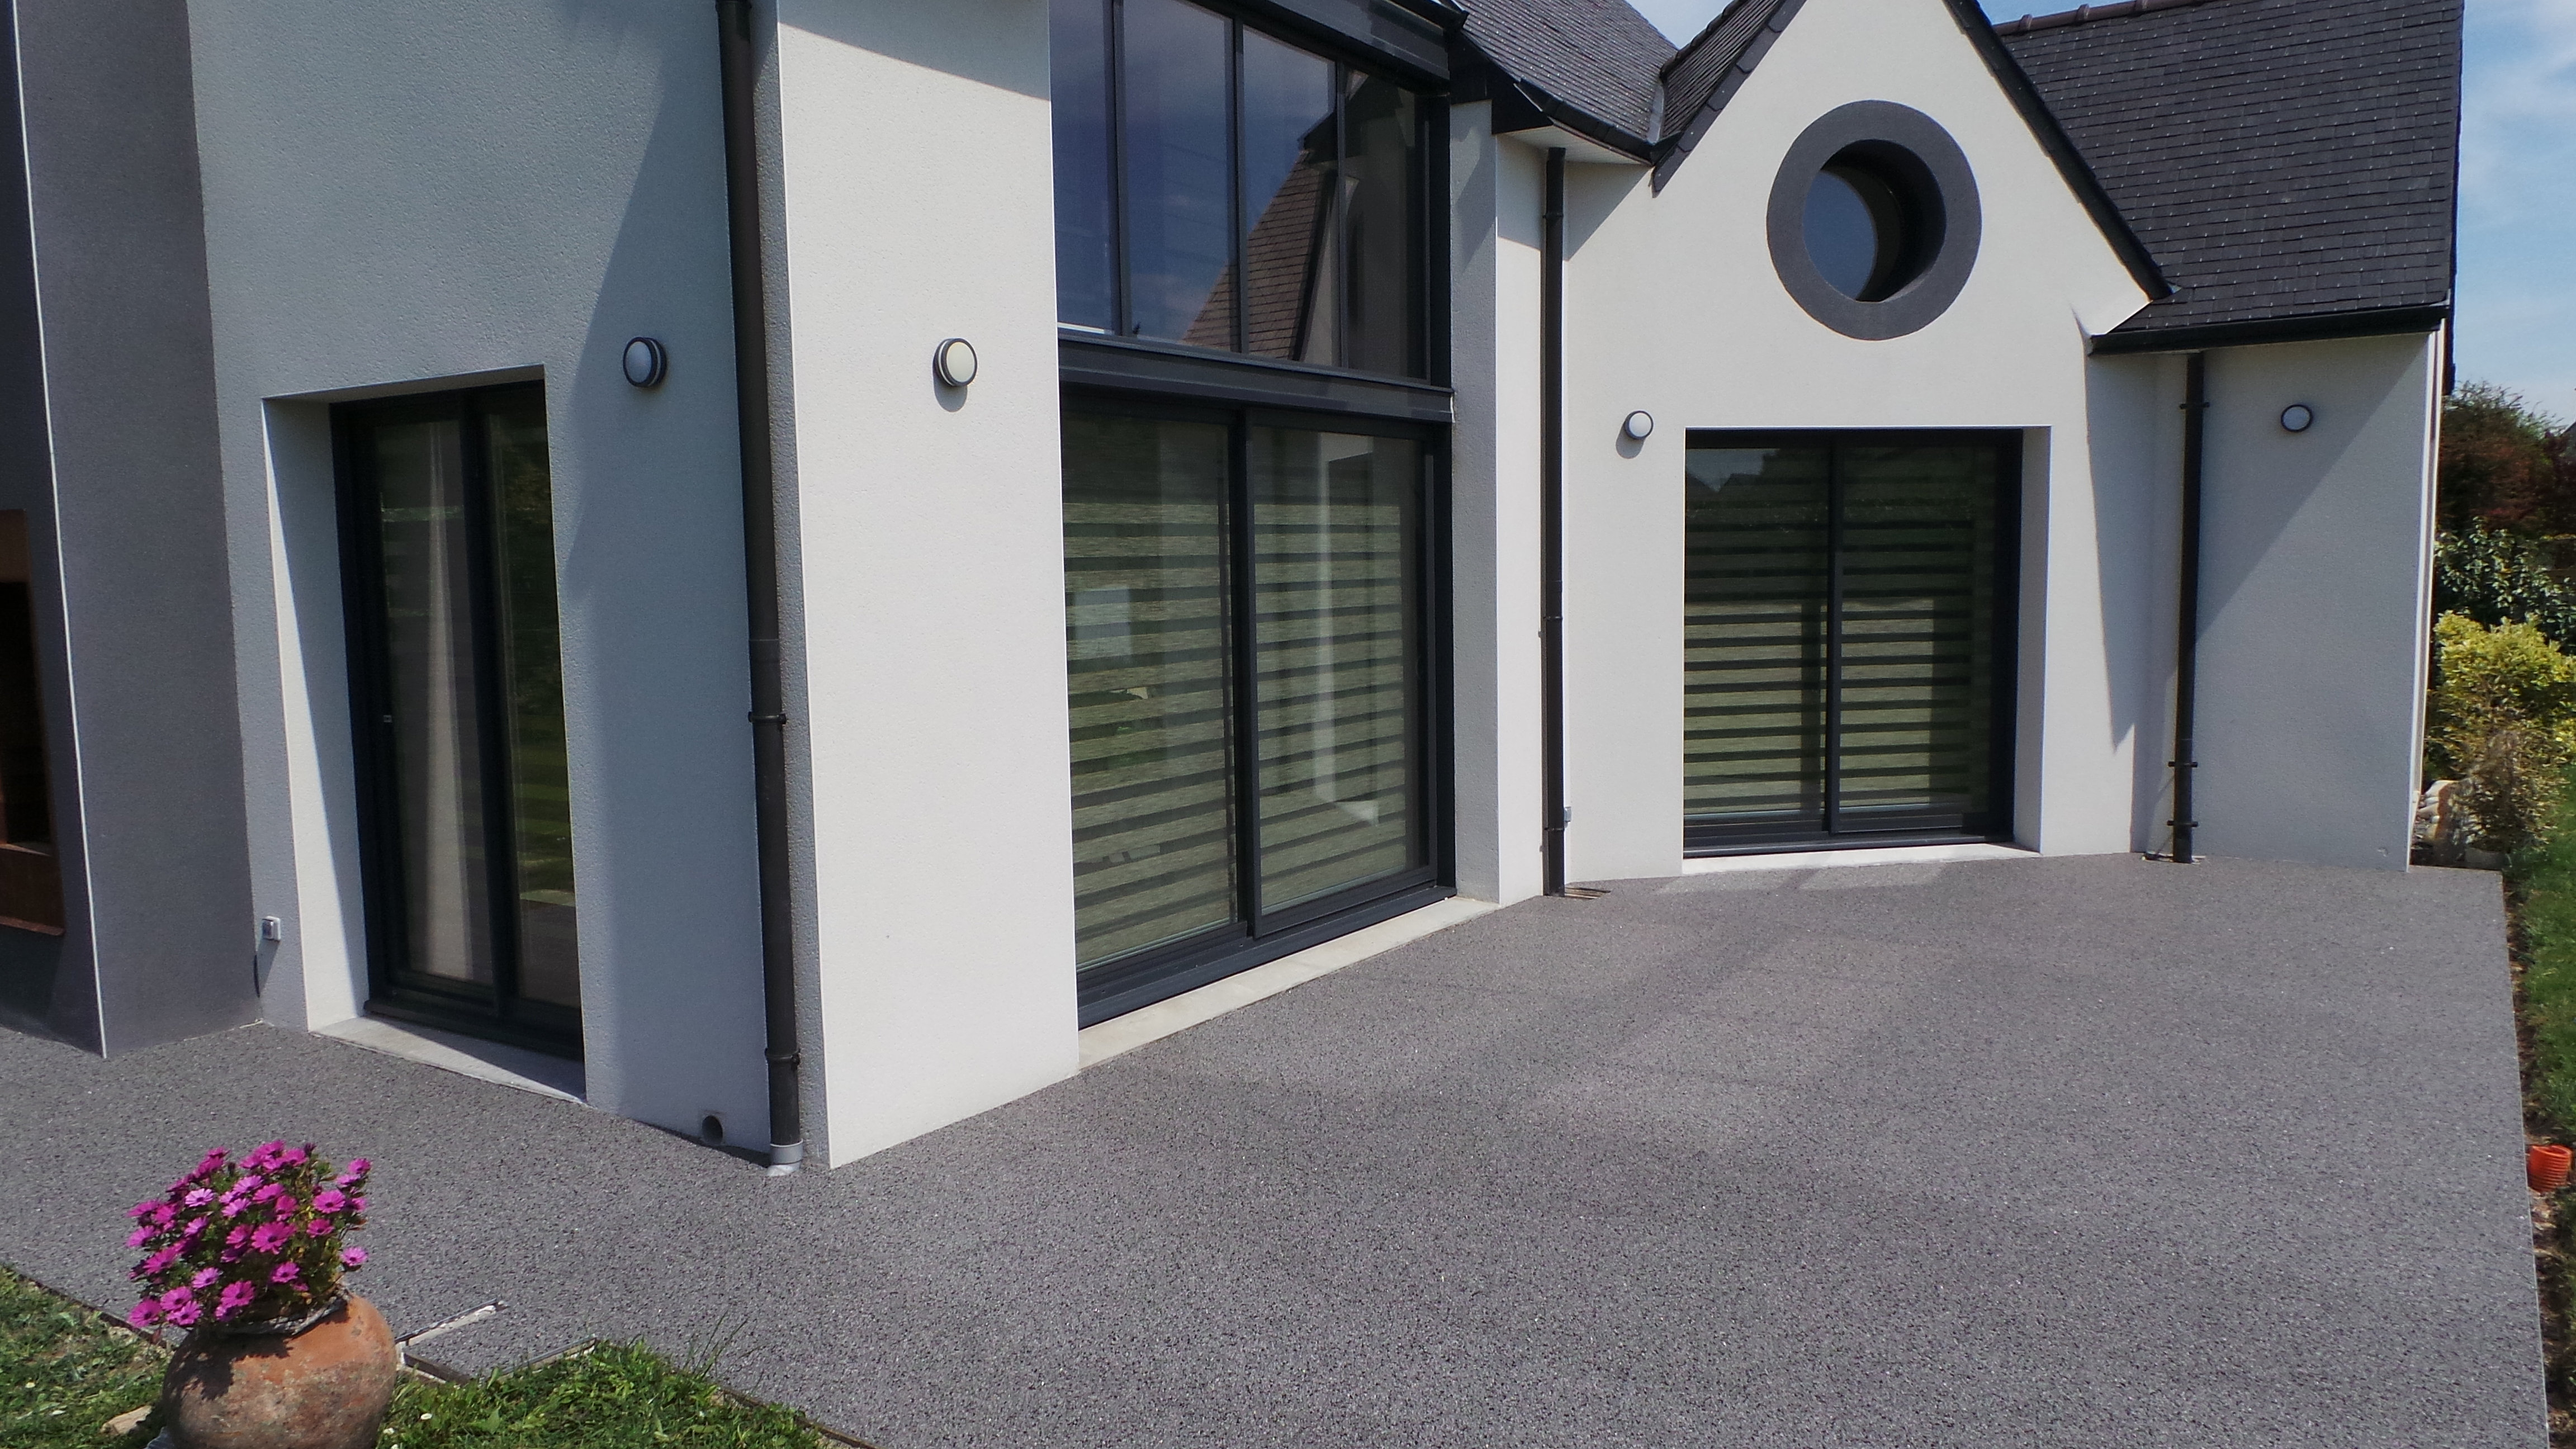 revetement sol exterieur terrasse 25 beste idee n over revetement terrasse op pinterest resine. Black Bedroom Furniture Sets. Home Design Ideas